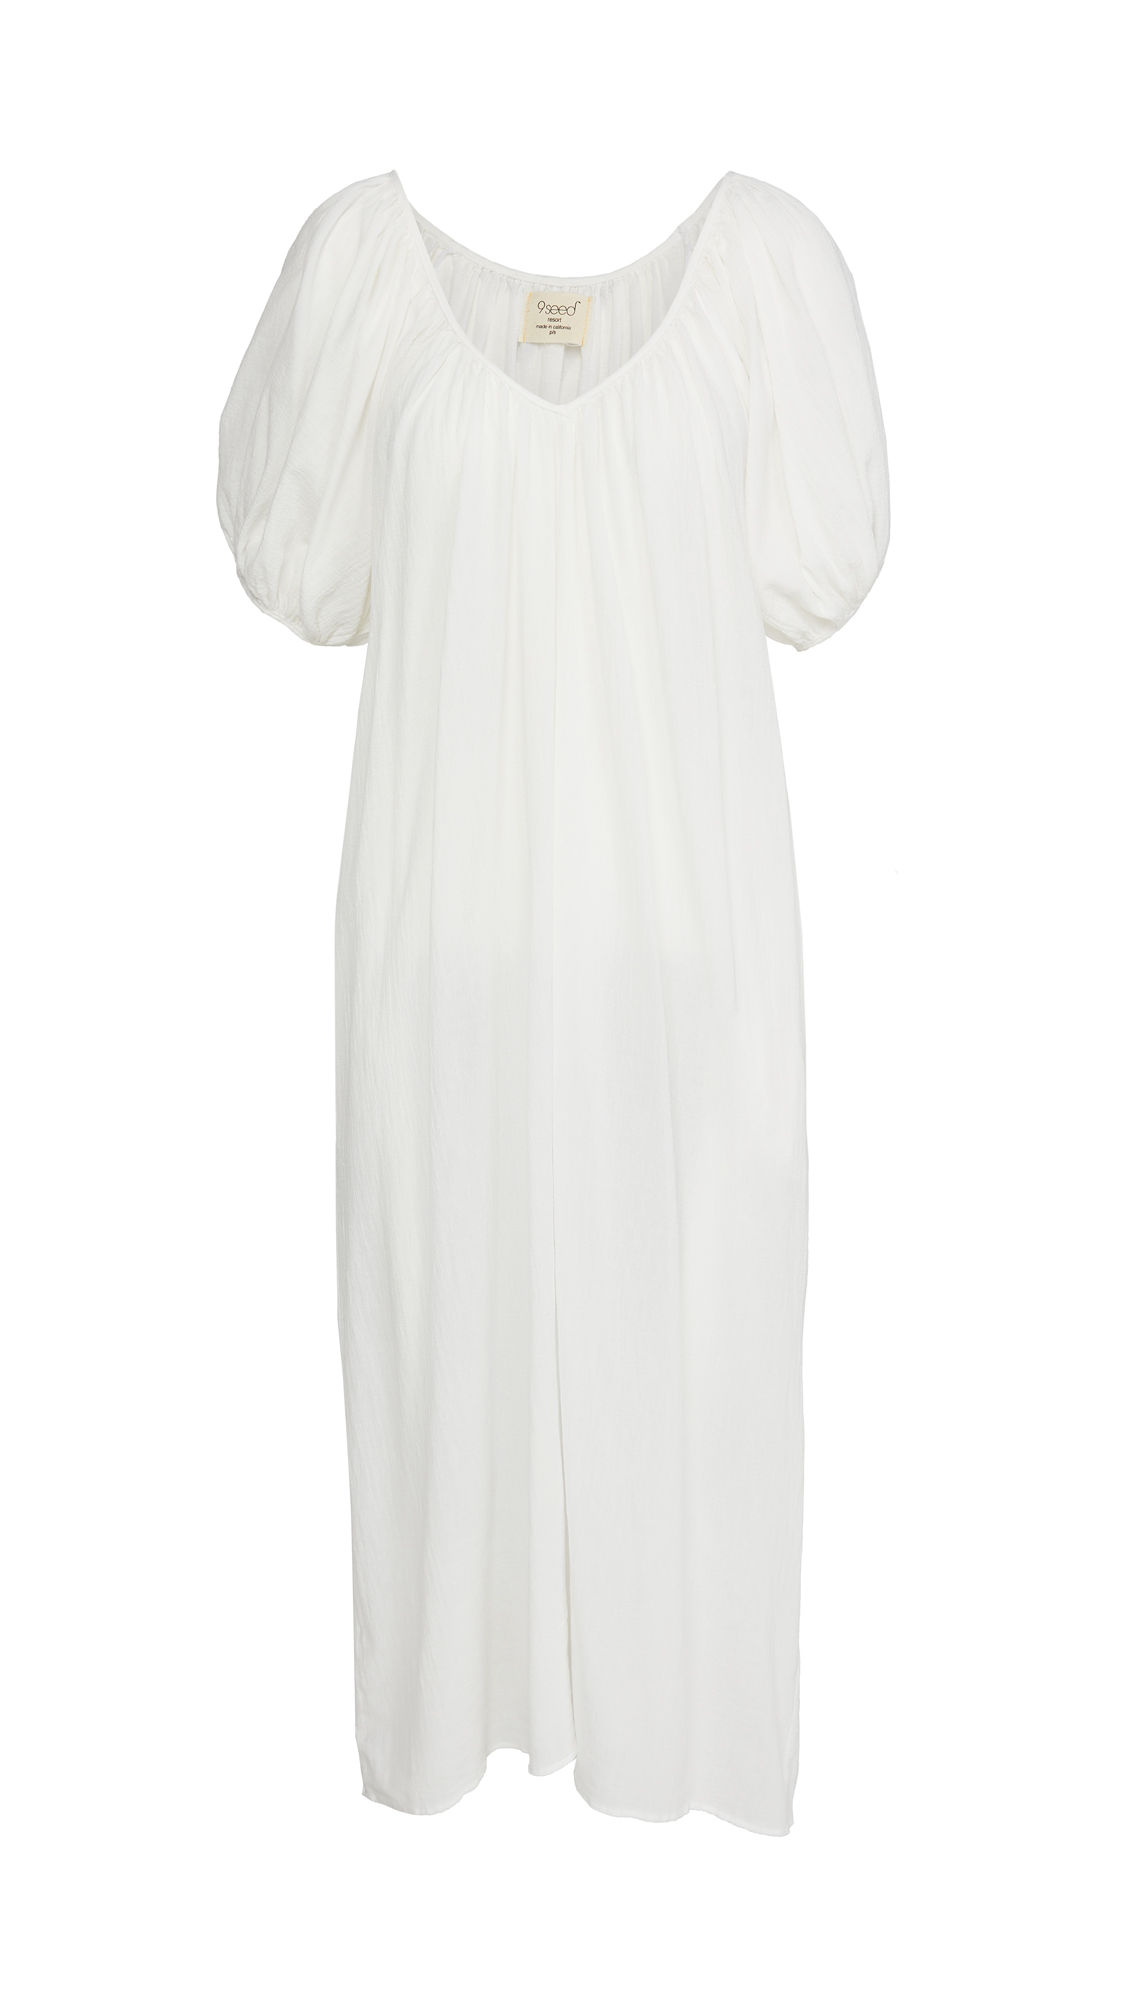 9seed Sand Hill Puff Sleeve Dress